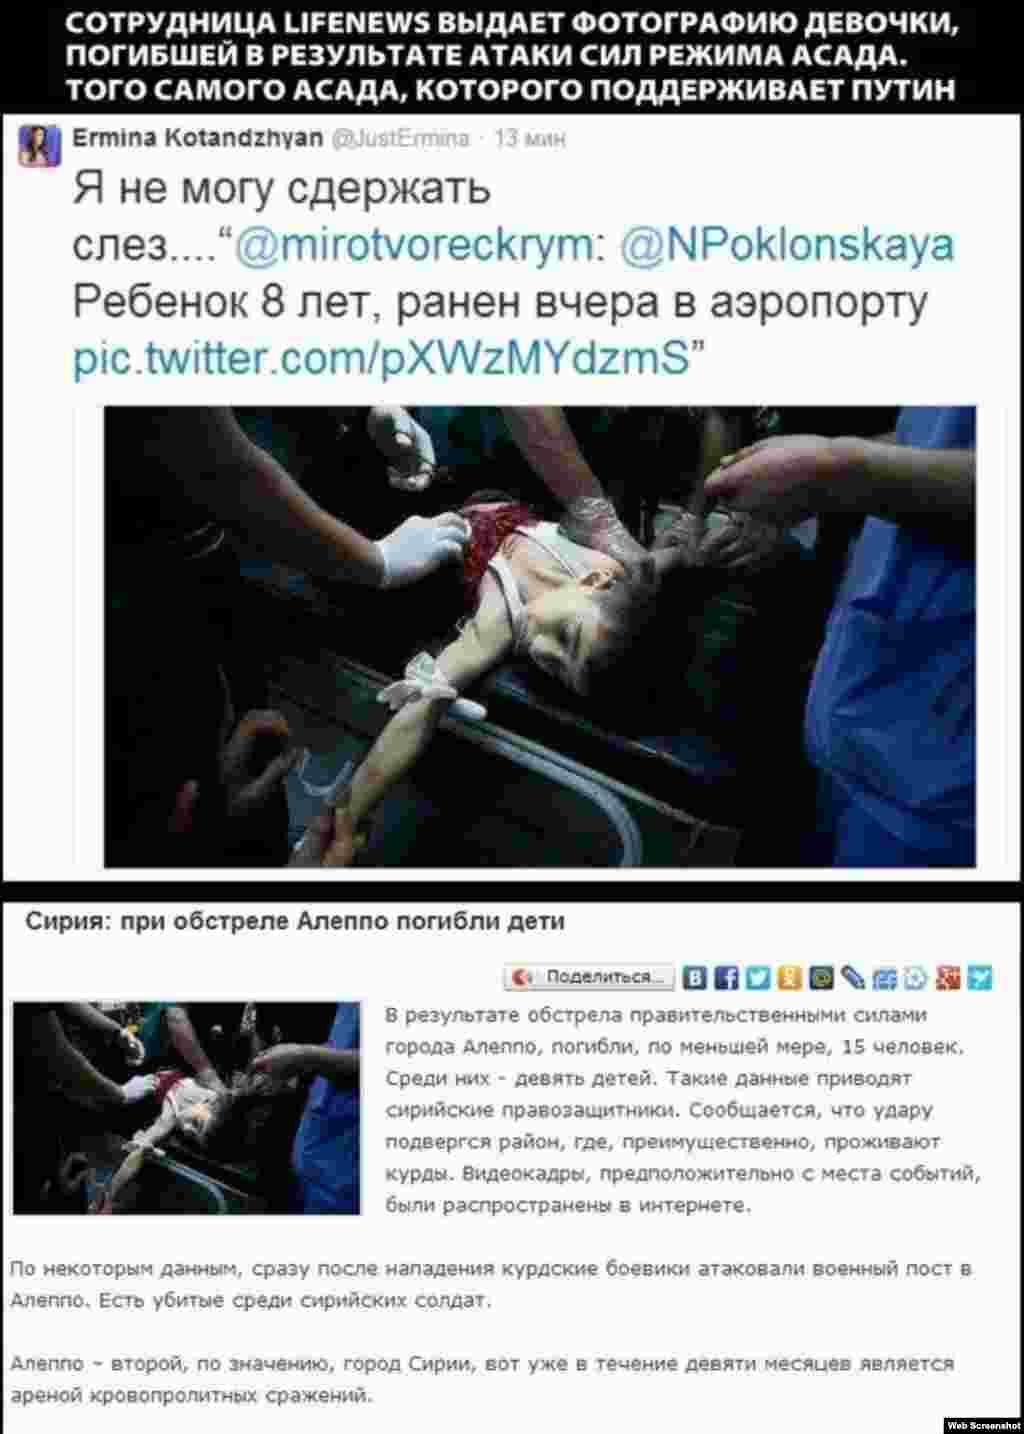 "LifeNews журналисты Twitterда ""Донецки һава аланында яраланган малай"" фотосын урнаштырда. Әмма бу фото 2013 елда Сүриядә төшерелгән."